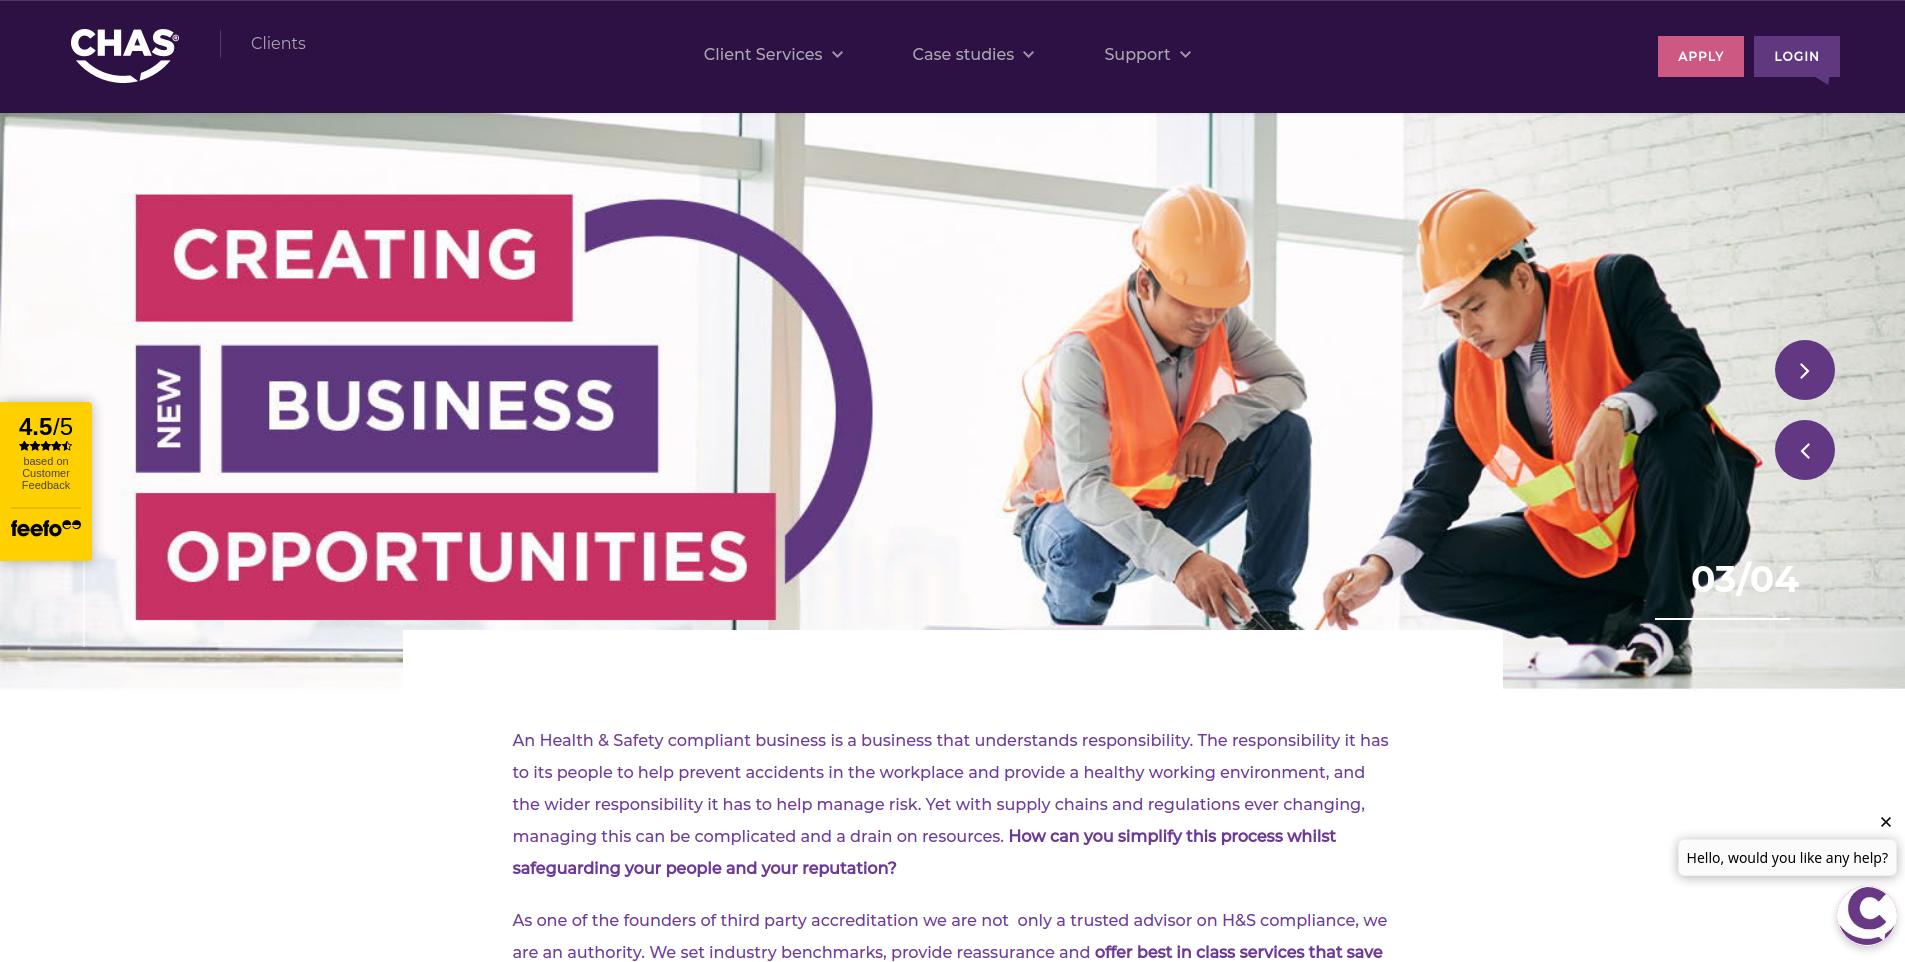 CHAS Service page screenshot